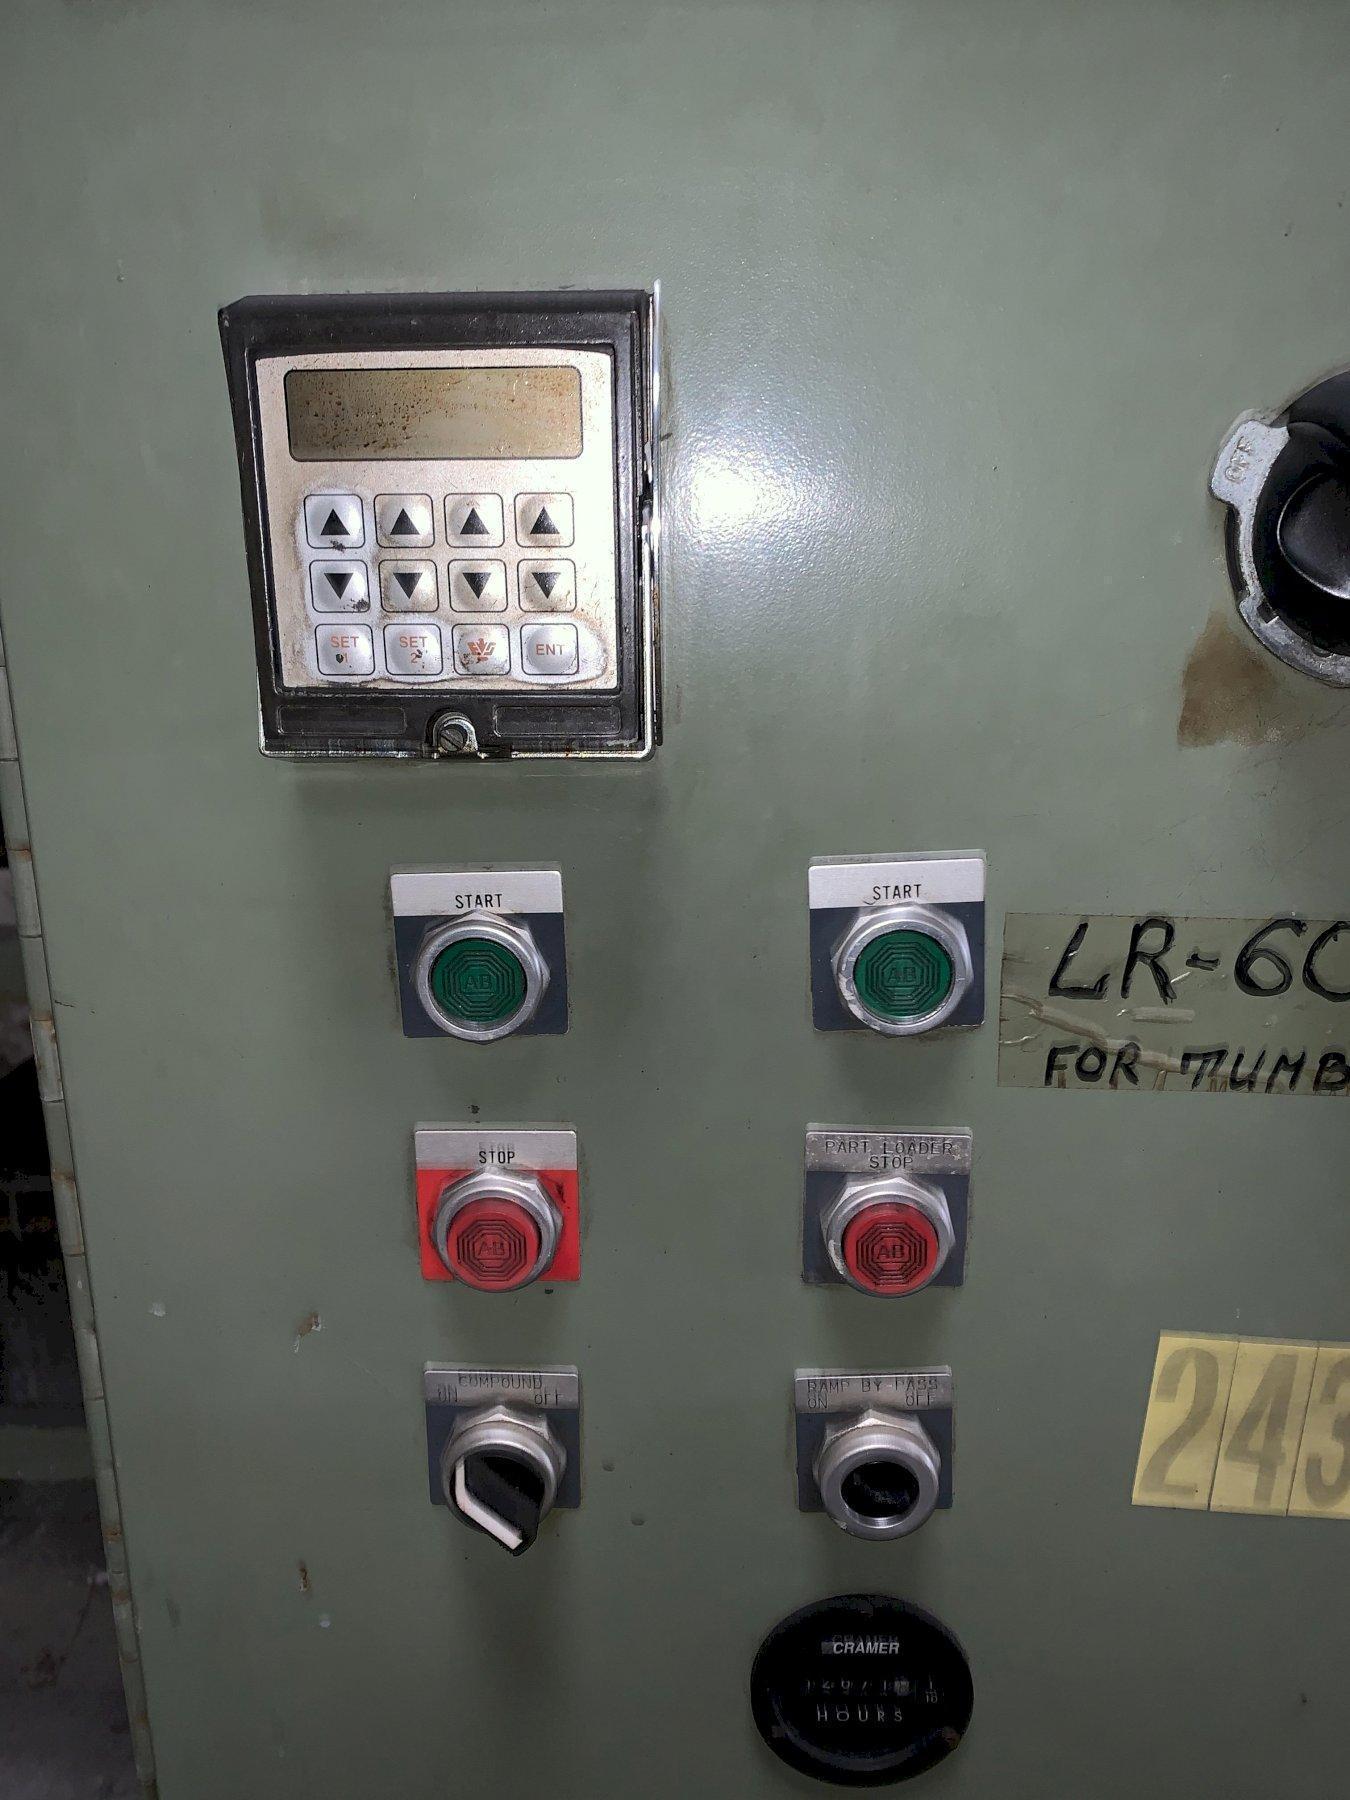 9 CU FT ULTRAMATIC MODEL SVB-10 AUTOMATIC VIBRATORY DEBURRING SYSTEM